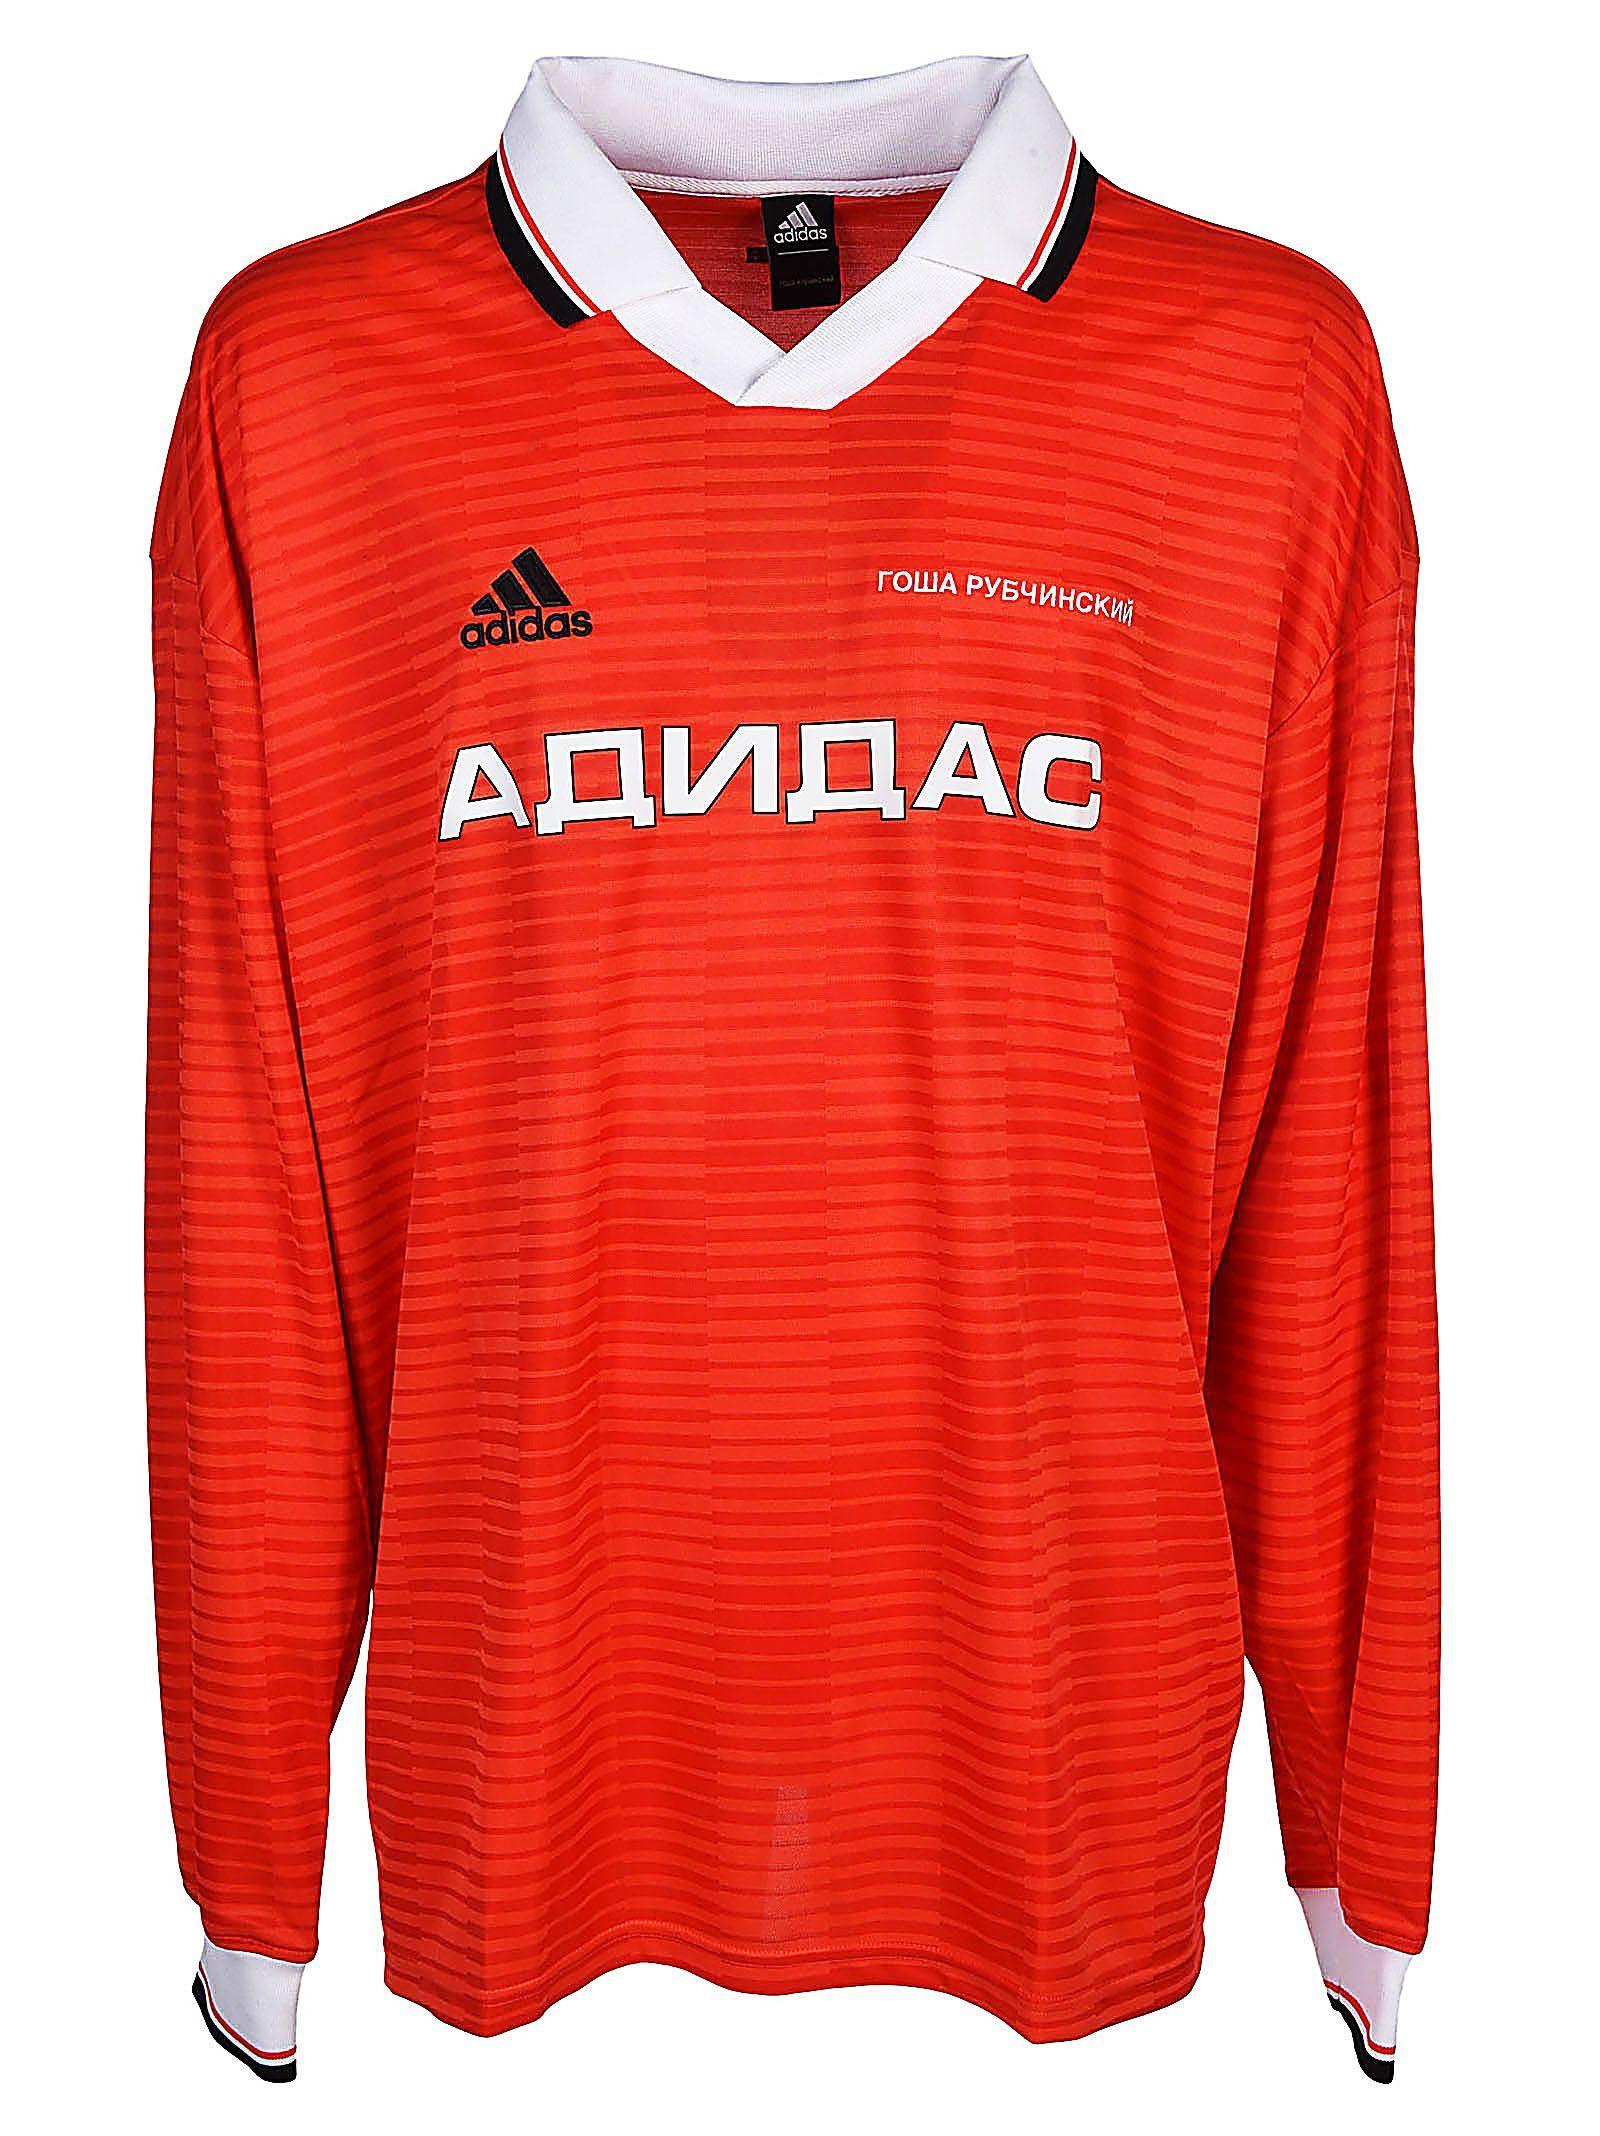 667472ccd GOSHA RUBCHINSKIY X ADIDAS FOOTBALL JERSEY STYLE T-SHIRT. #gosharubchinskiy  #cloth #